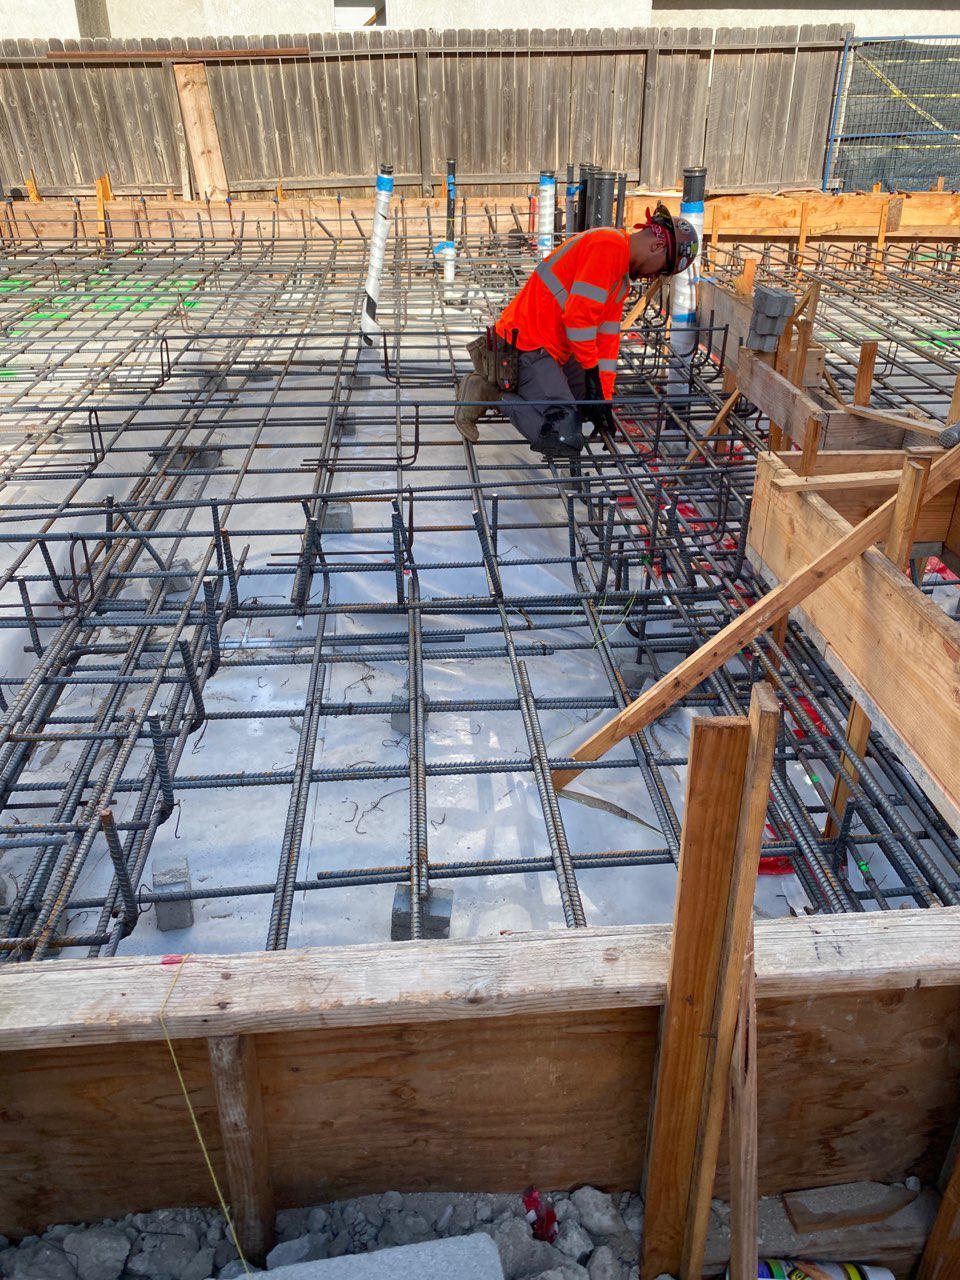 Concrete Forming, Rebar Installation, Moment Frame Bolts Installation, Pouring Concrete